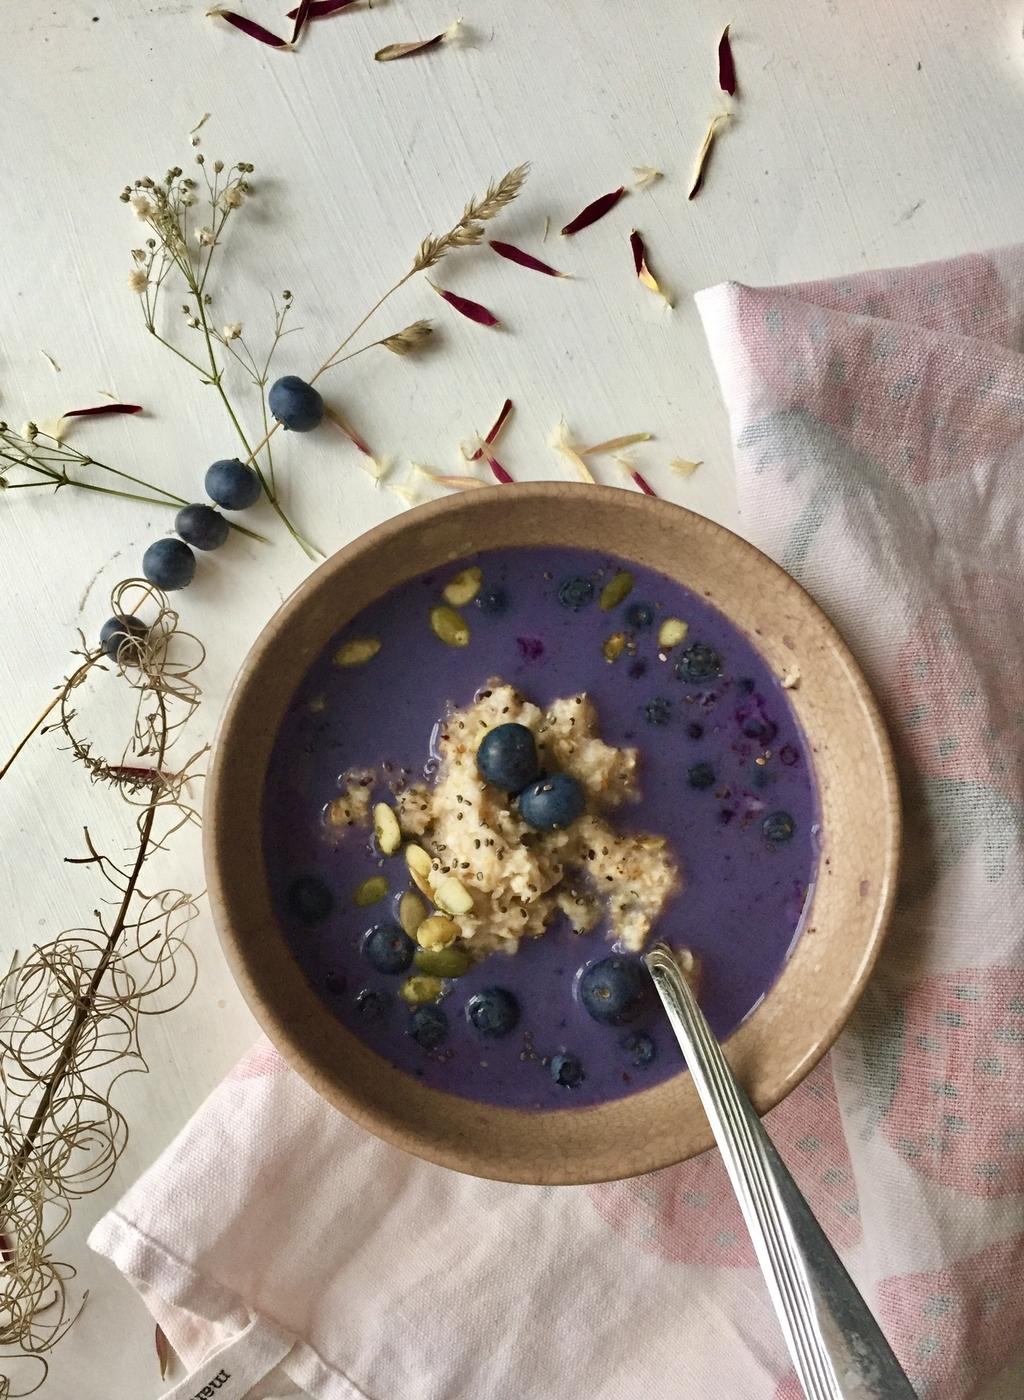 Taatelia ja mustikkamaitoa – 2x rakkaimmat aamupuuroni